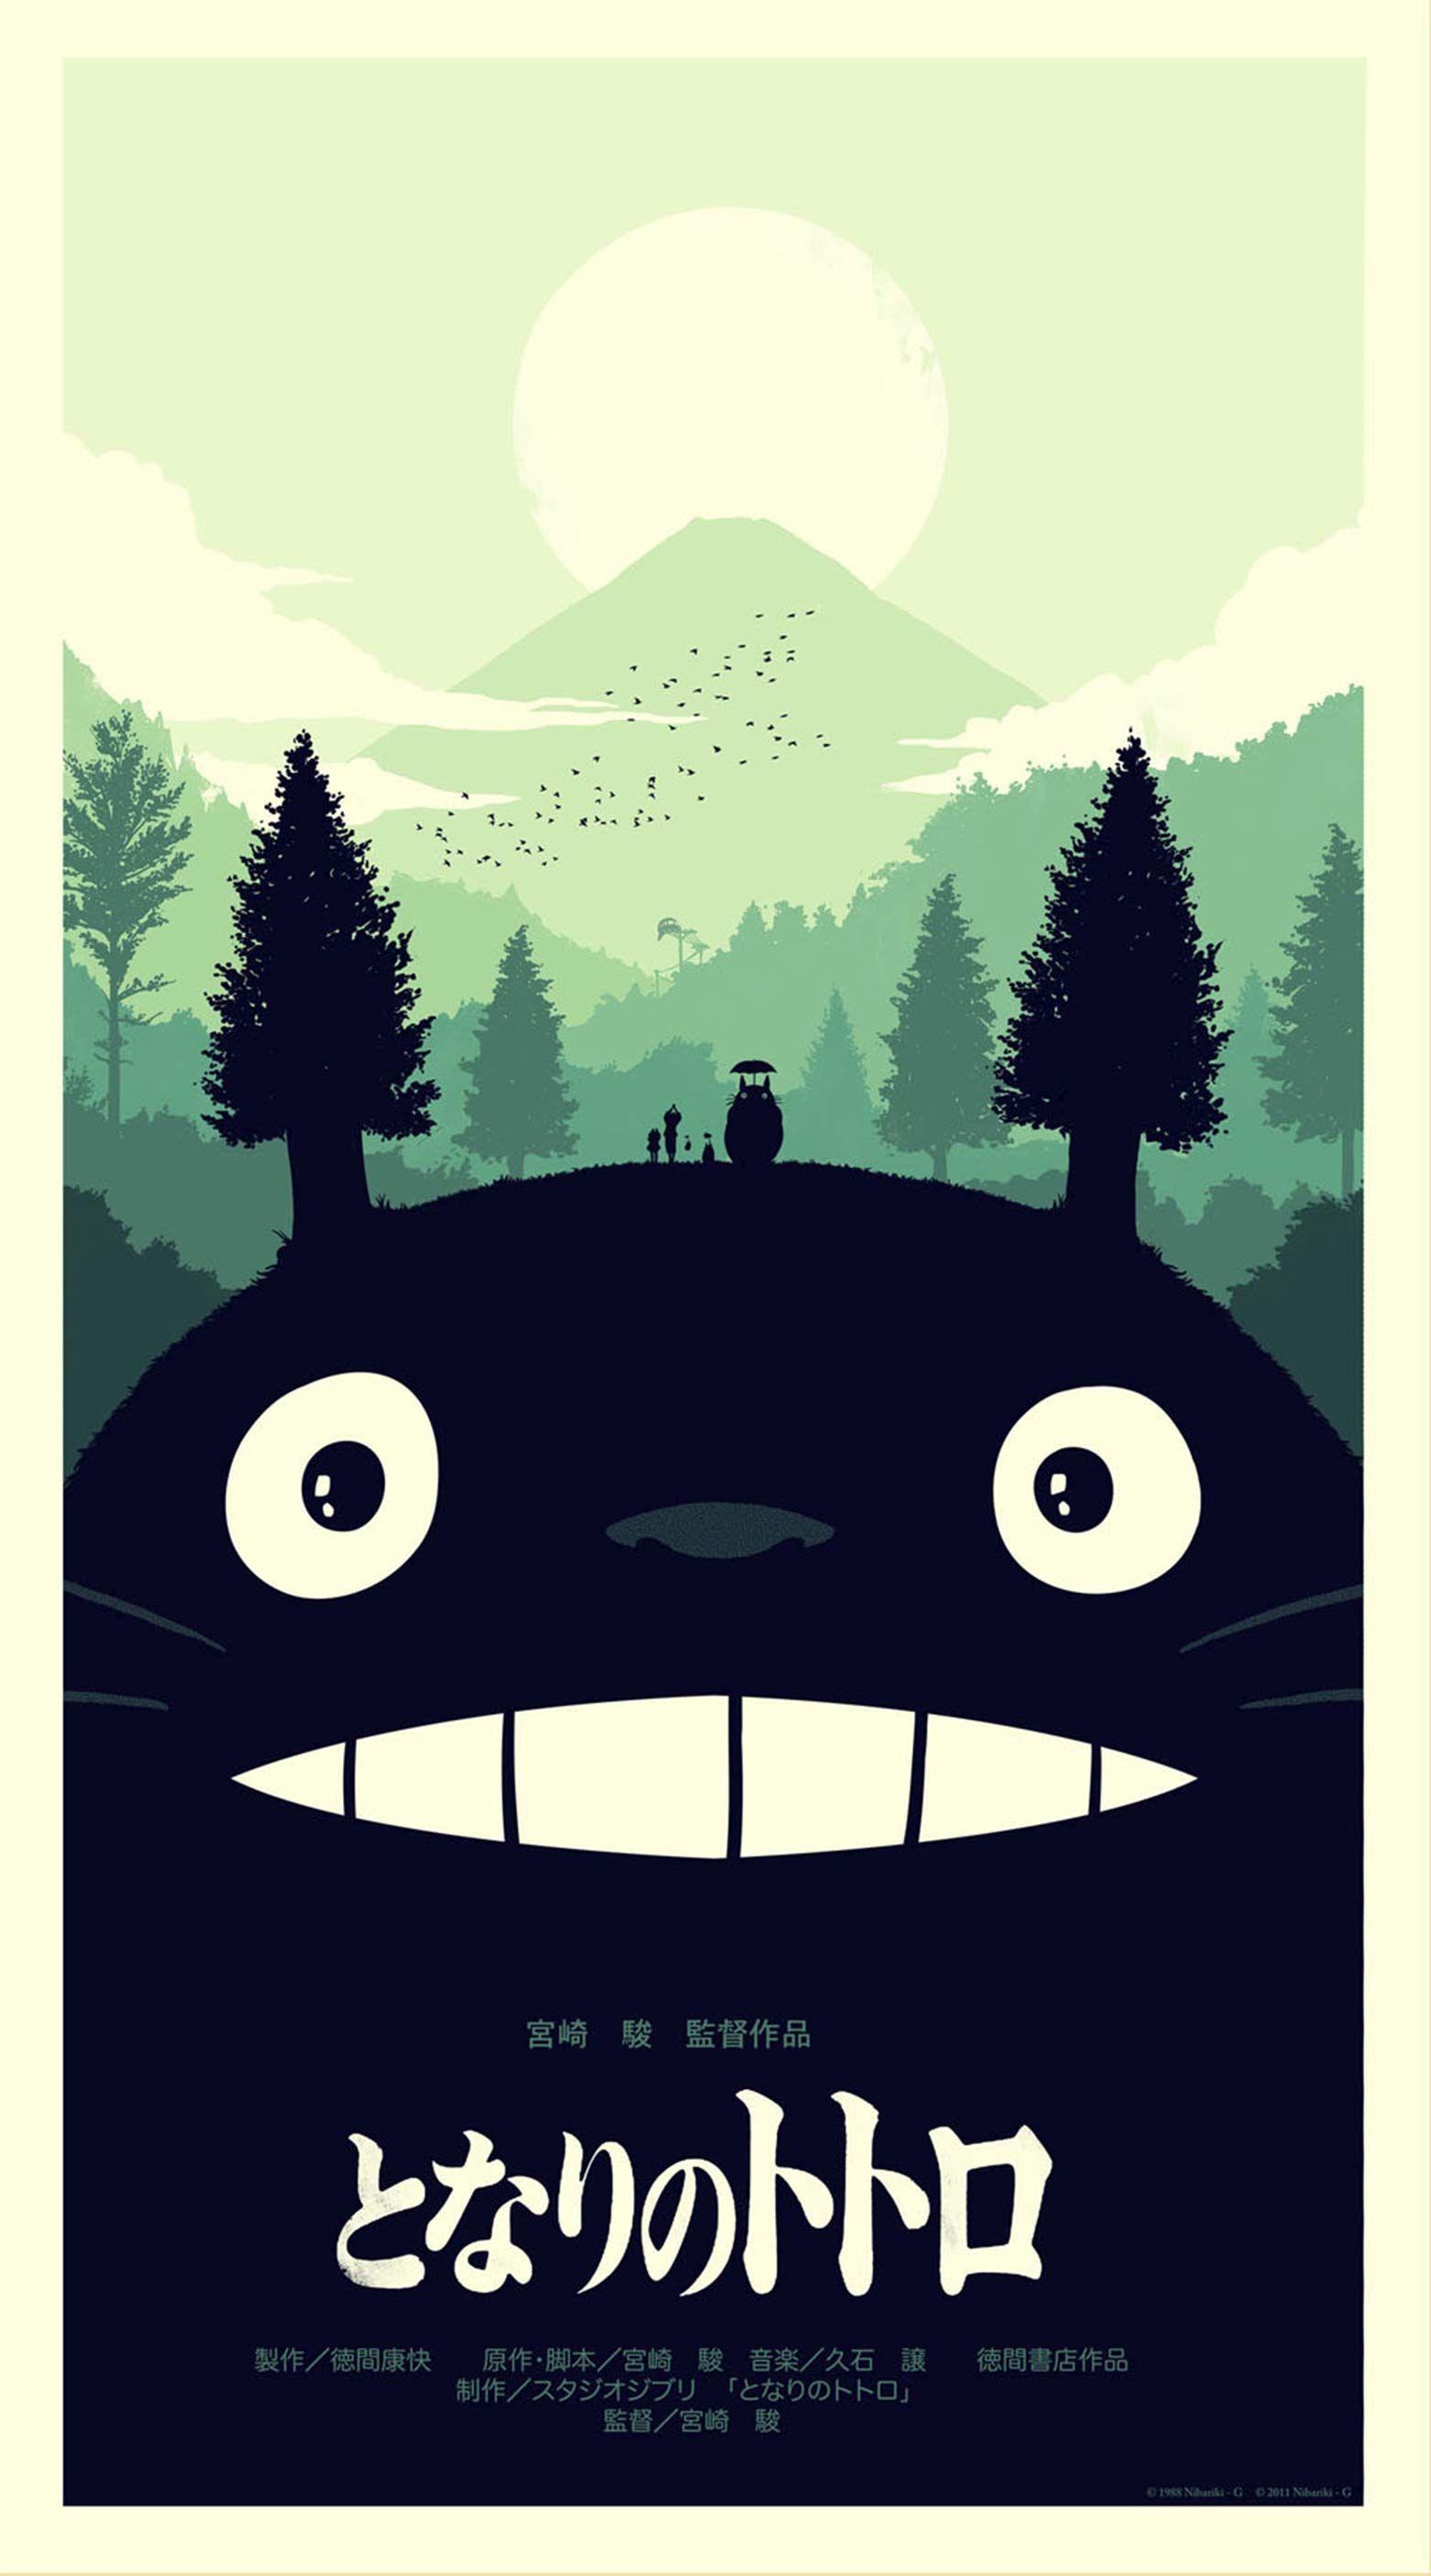 Classic film posters reimagined | Webdesigner Depot